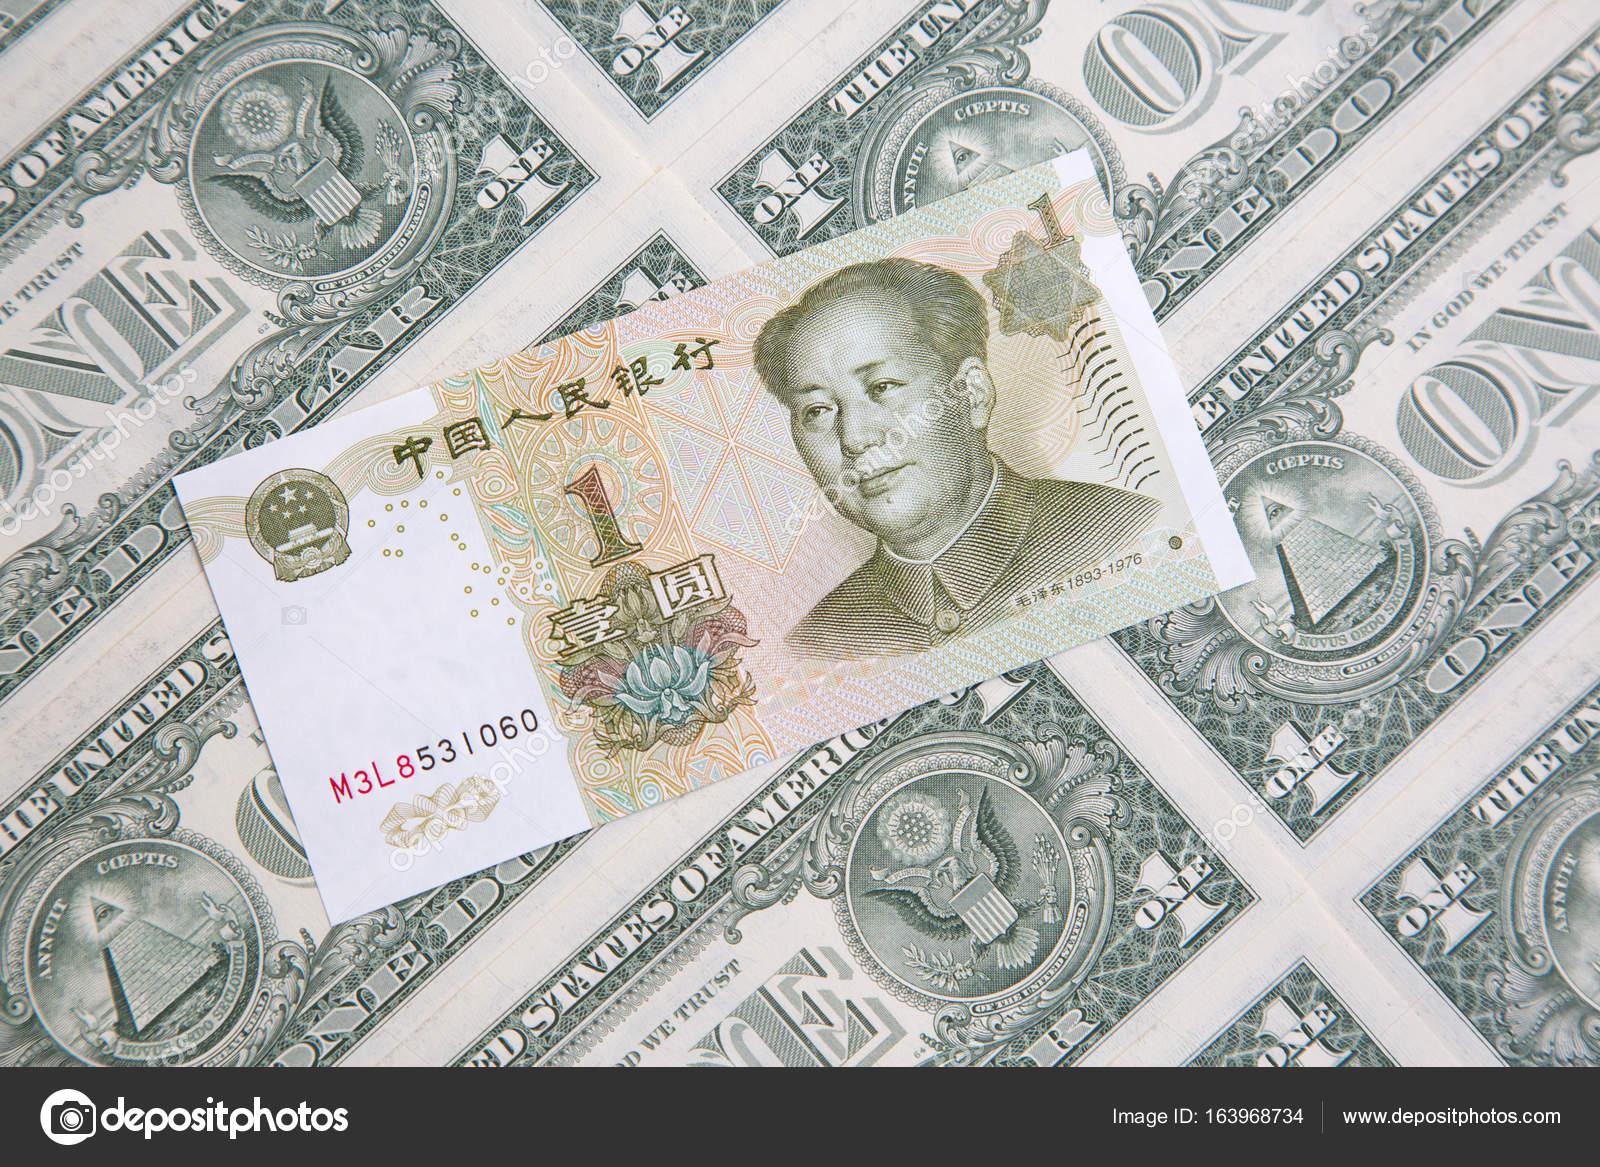 1 китайский юань к доллару промо код lite forex